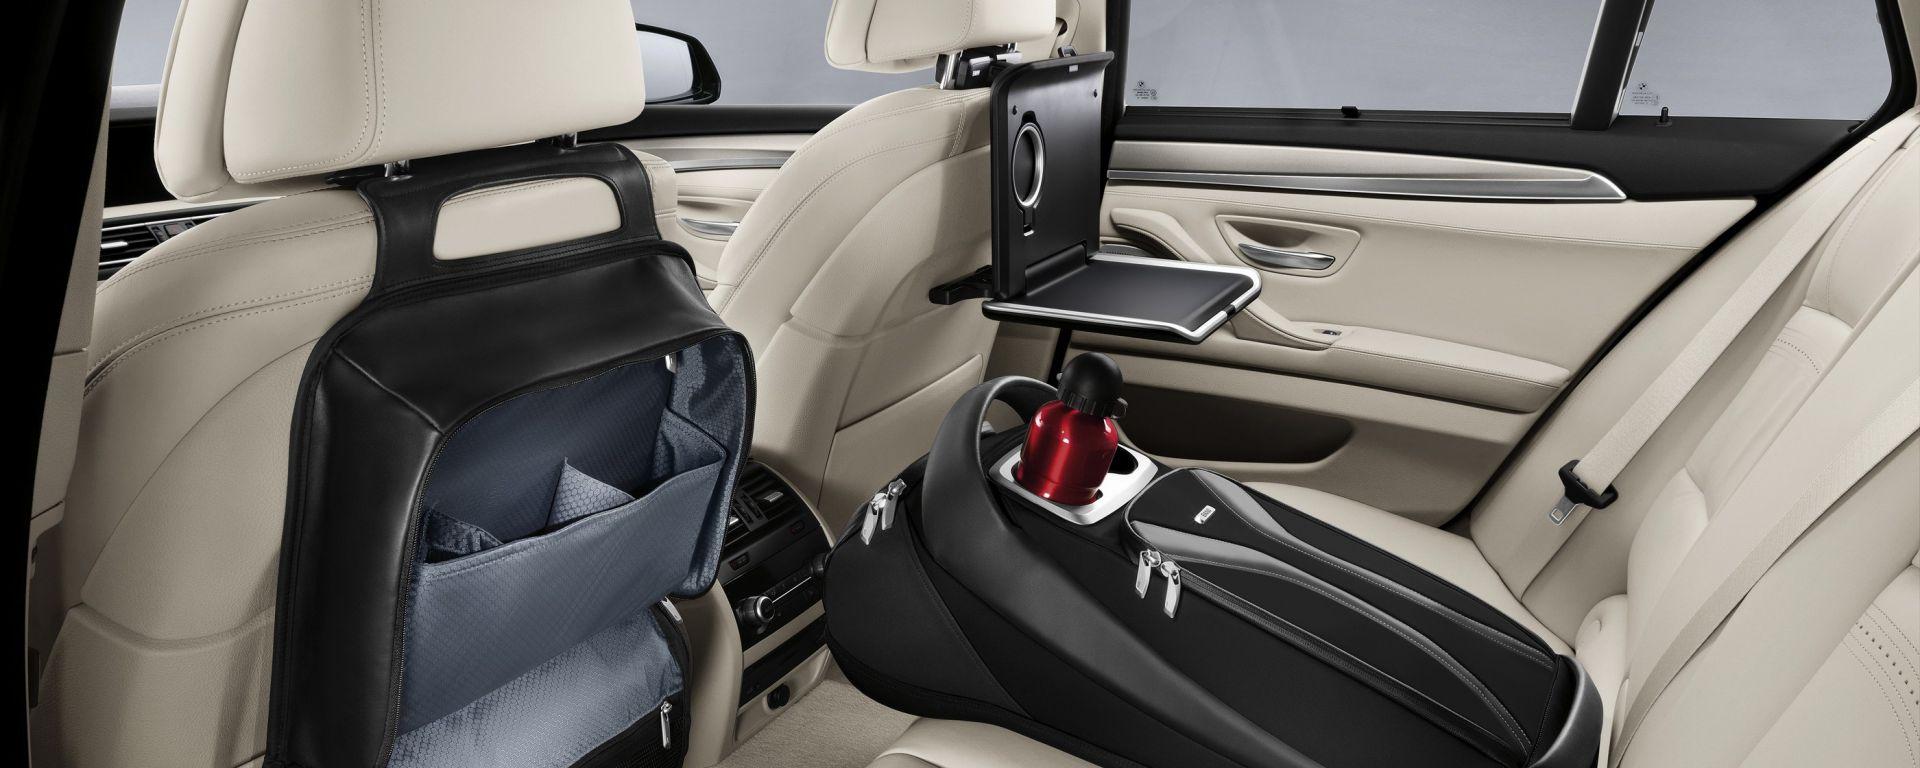 BMW TRAVEL & COMFORT SYSTEM